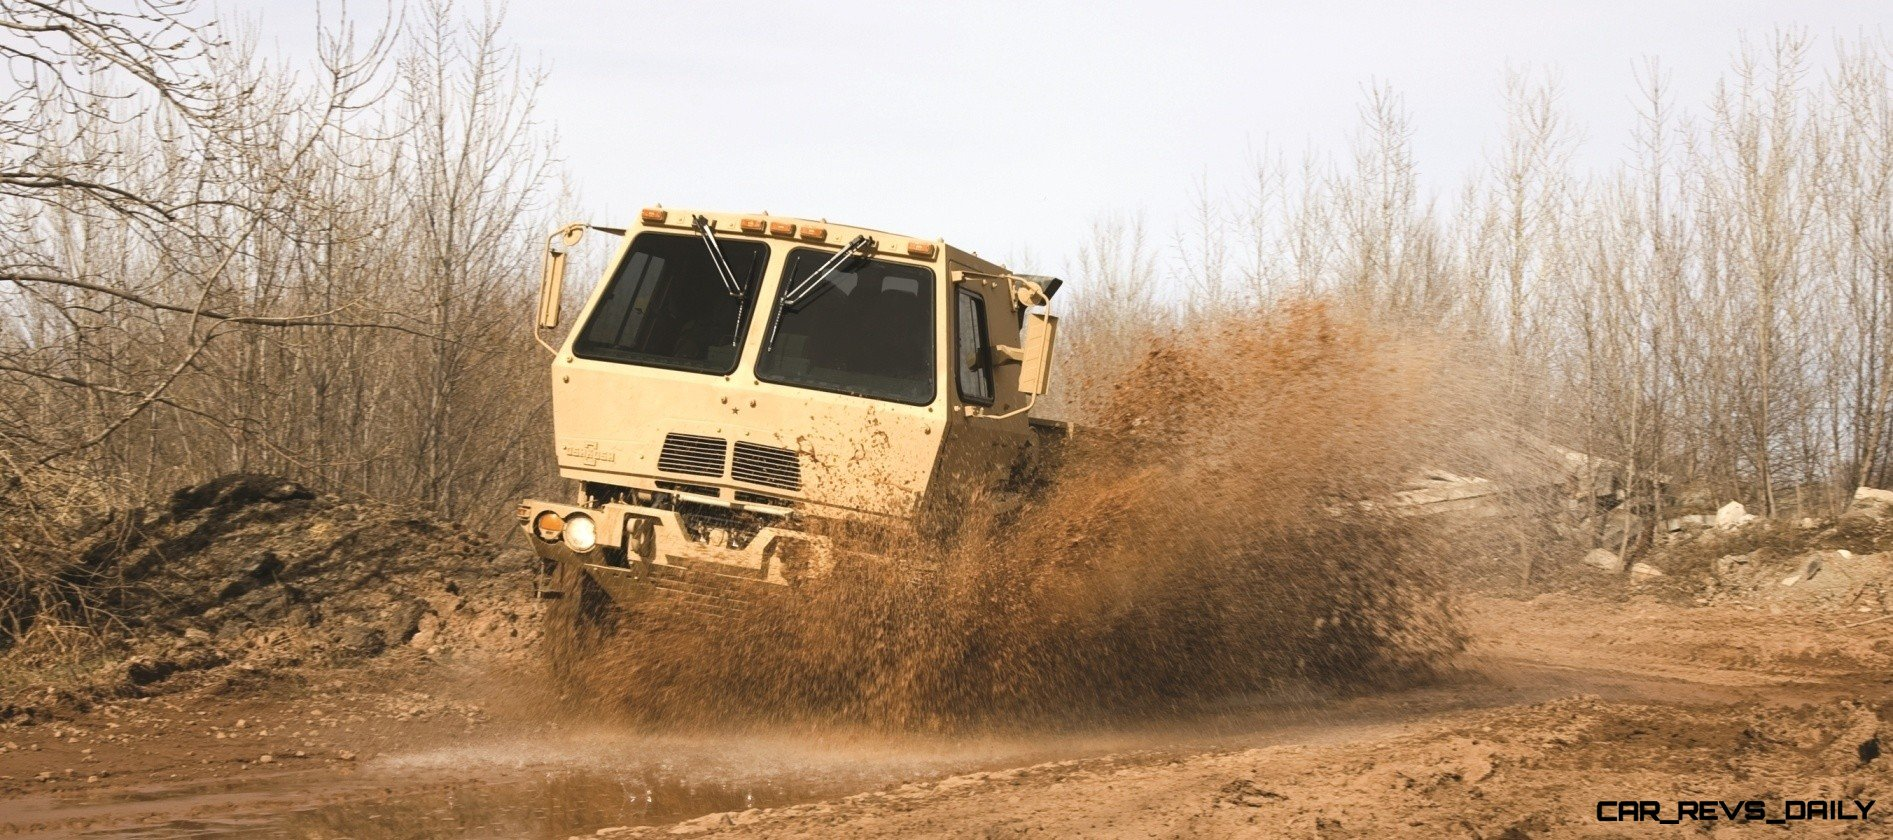 CarRevsDaily.com - Oshkosh Defense Medium and Heavy Showcase 2